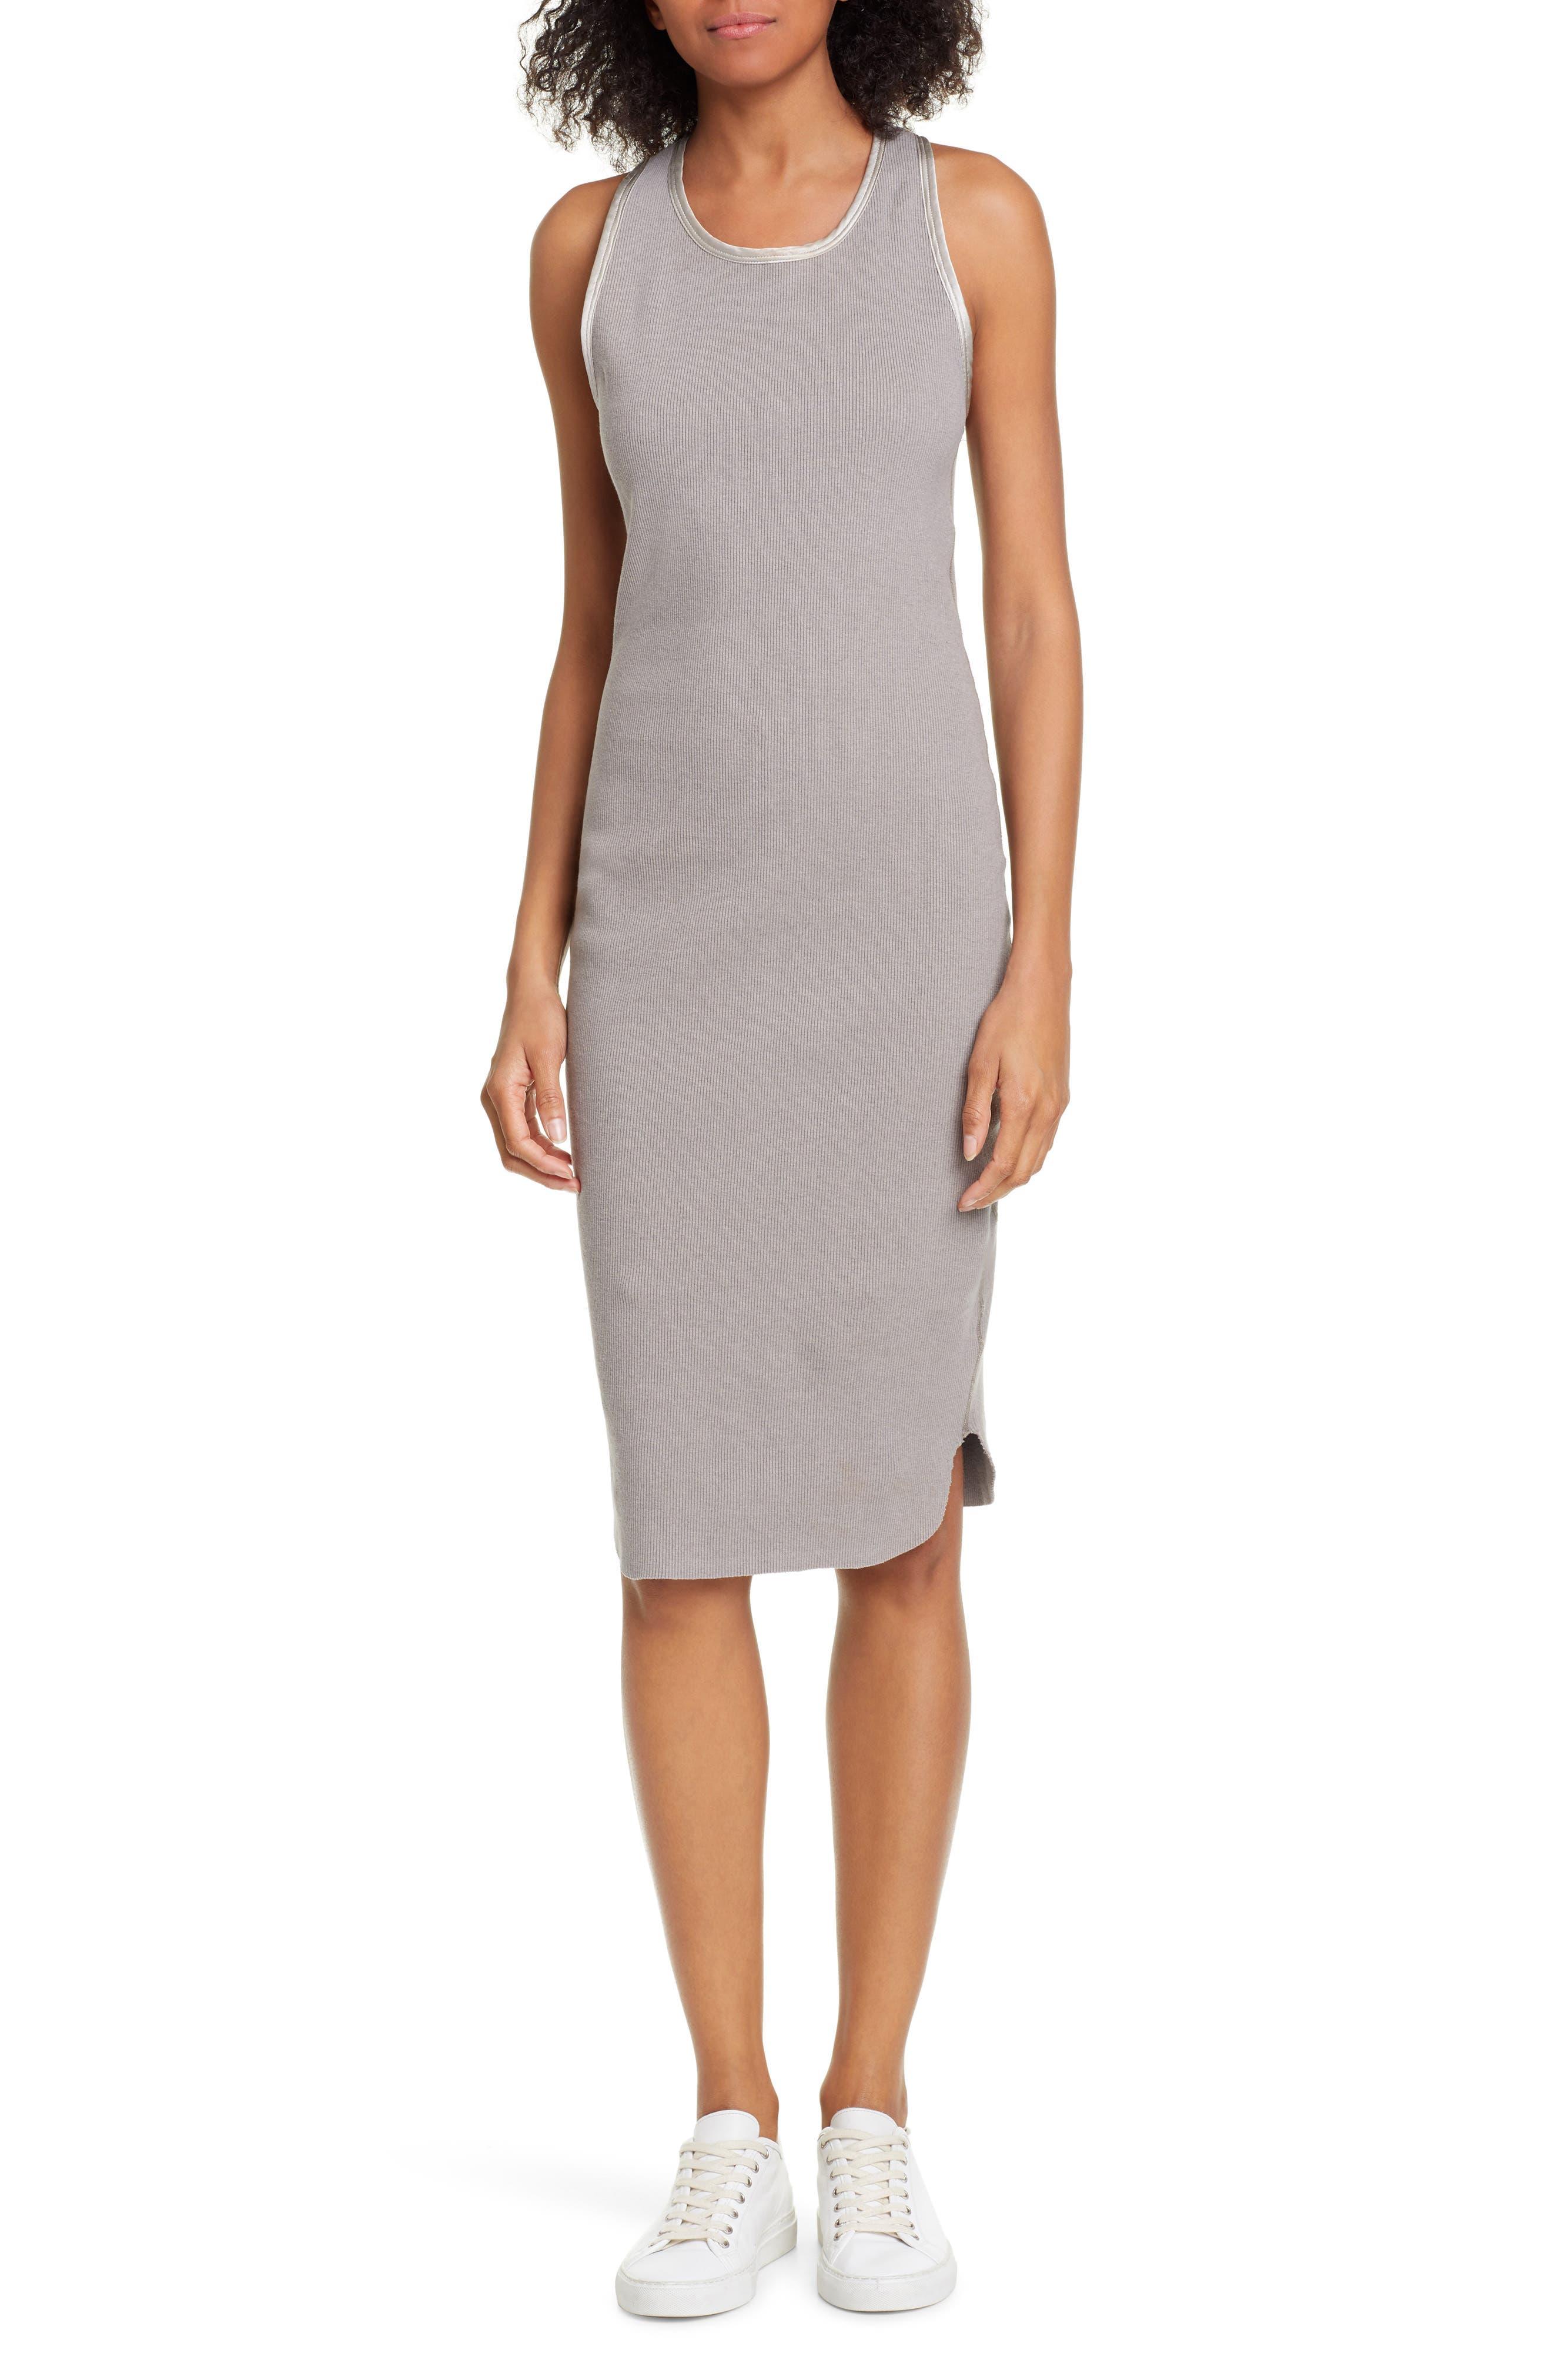 Perse Dresses